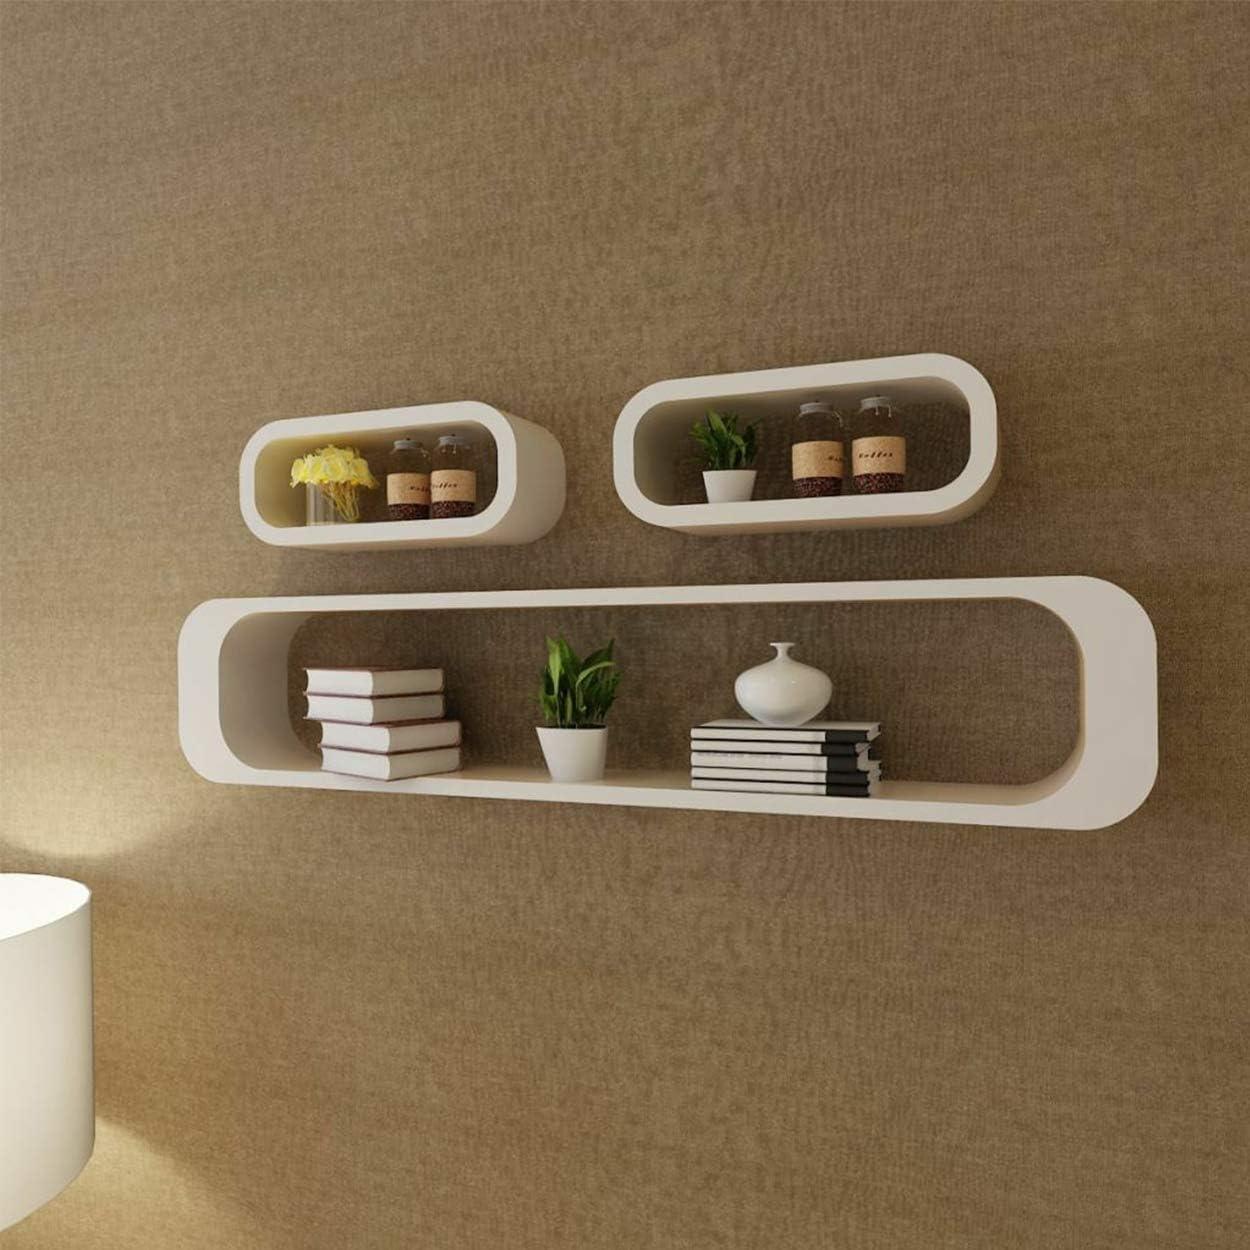 Amazon.com: CJ Online Shop Floating Wall Shelves Display Shelf